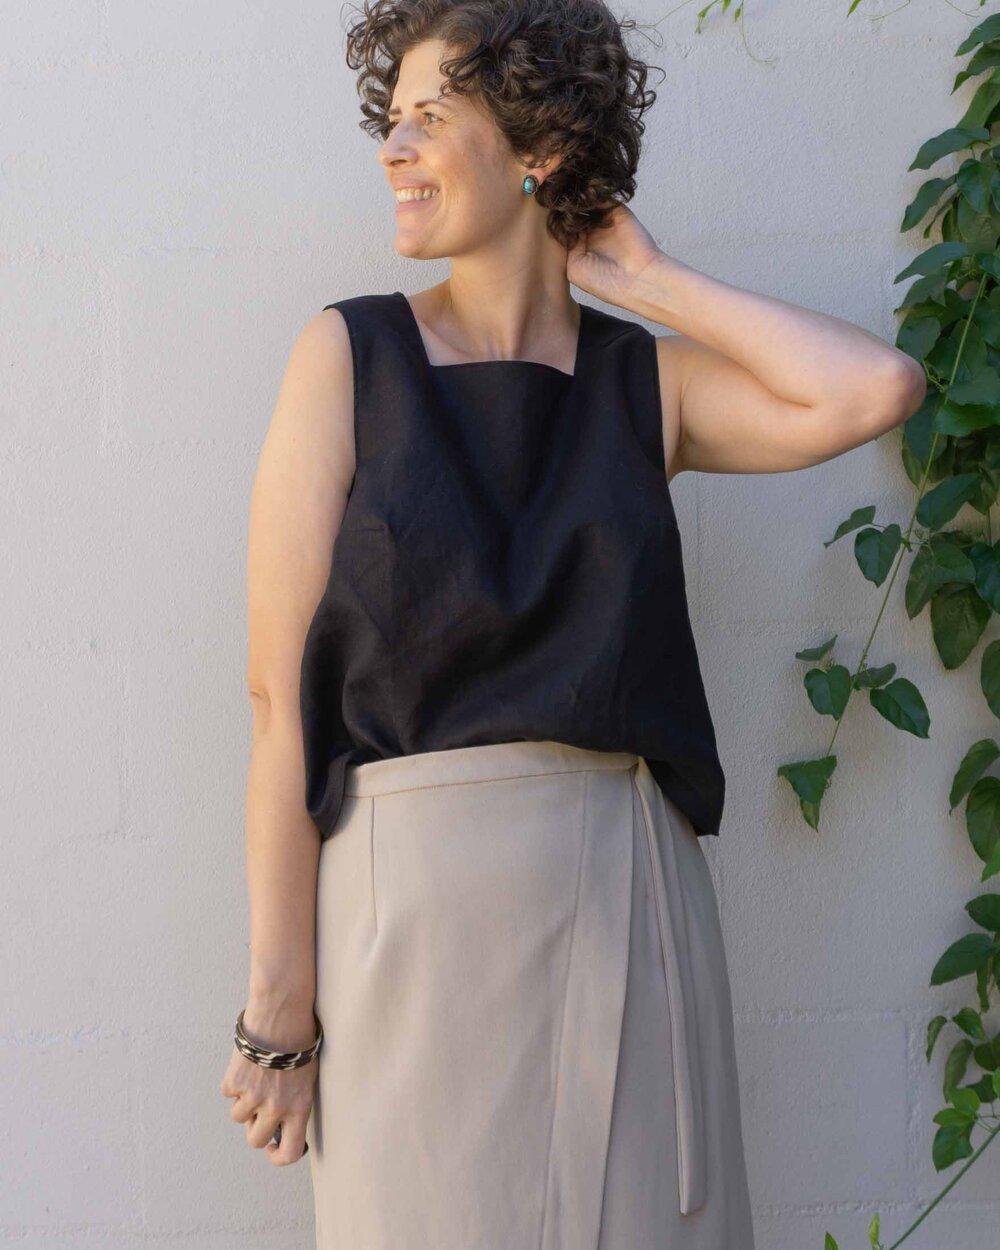 Button Back Tank Top - Miri Tank sewing pattern hack by Sew DIY